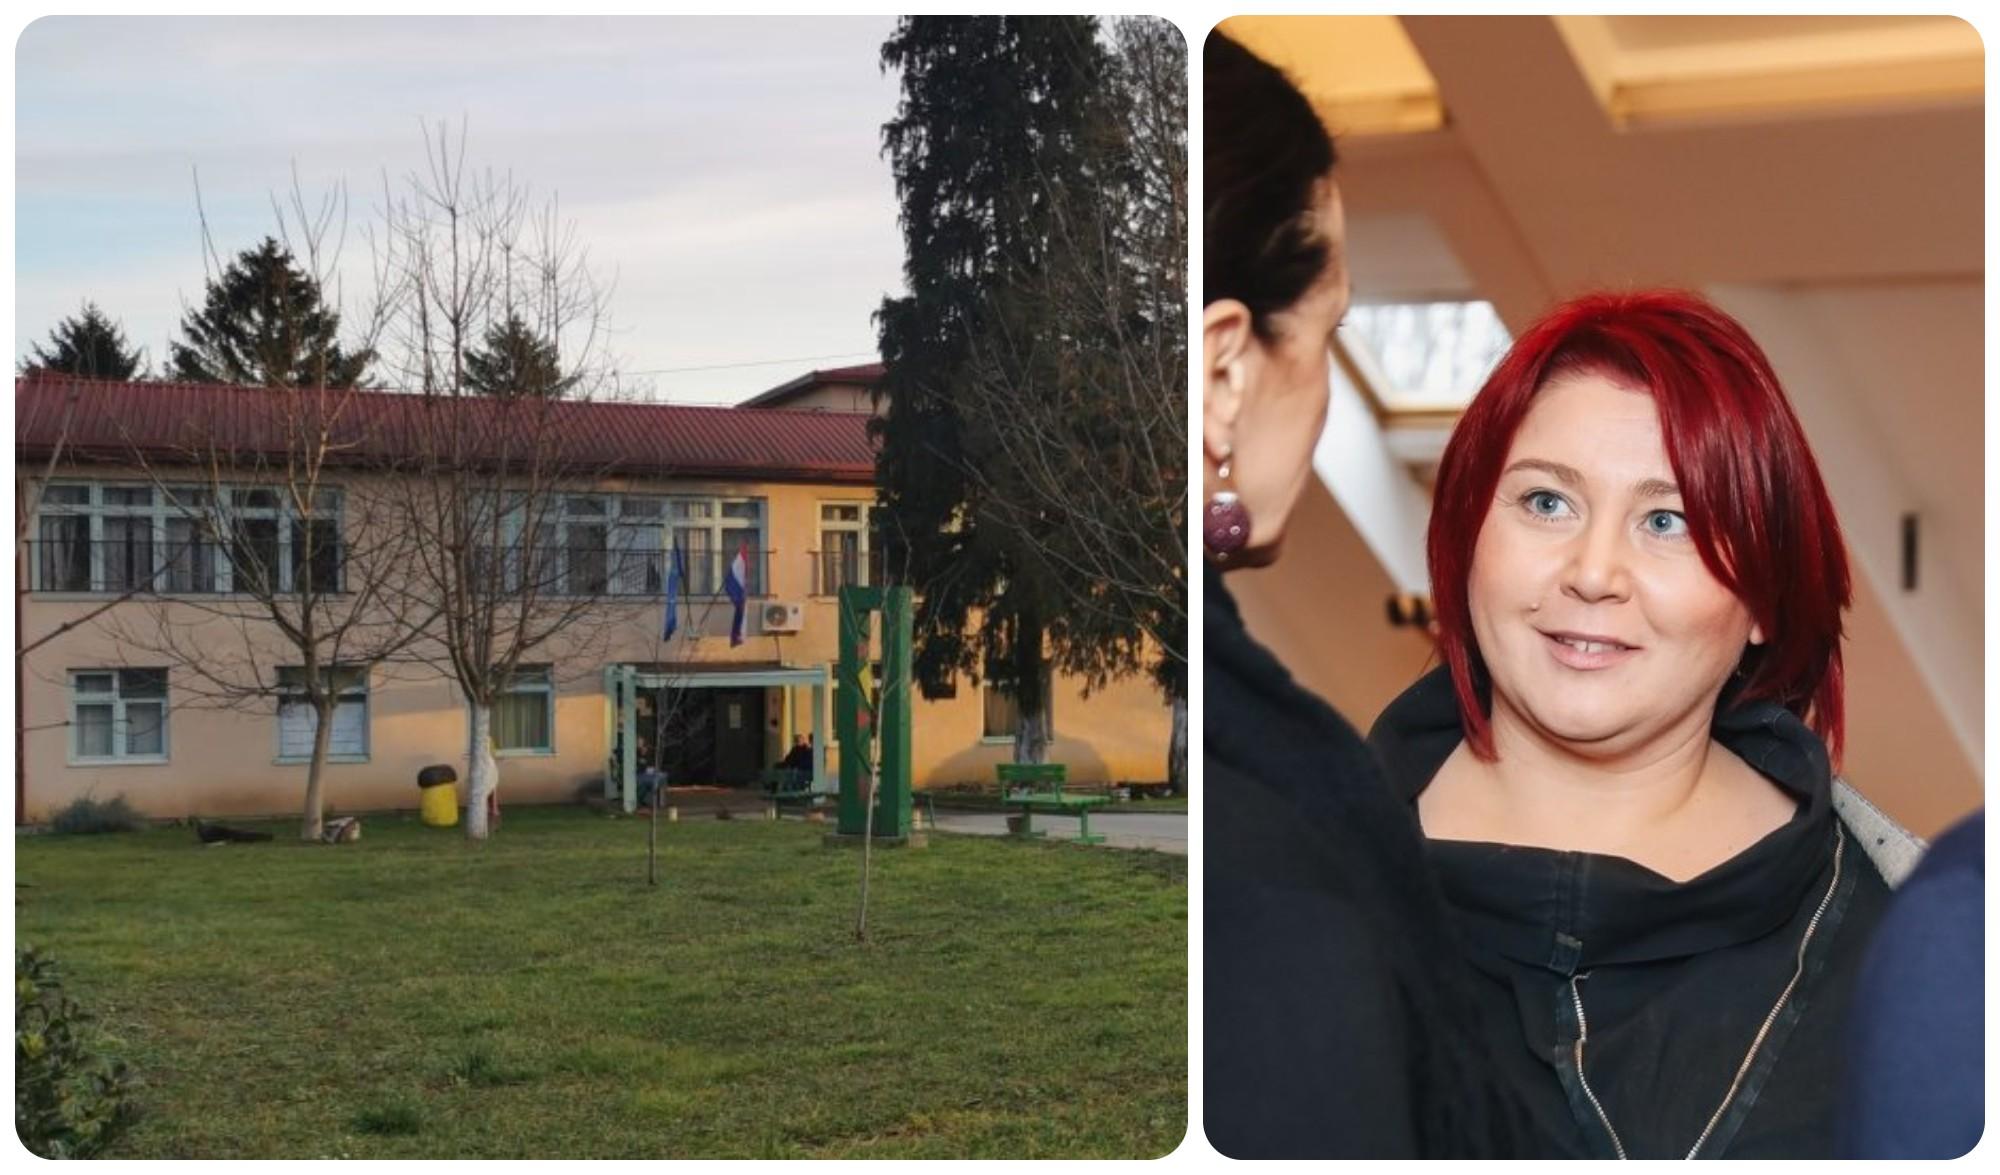 Zastupnica upozorila na prijave za spolno uznemiravanje u bjelovarskom Domu